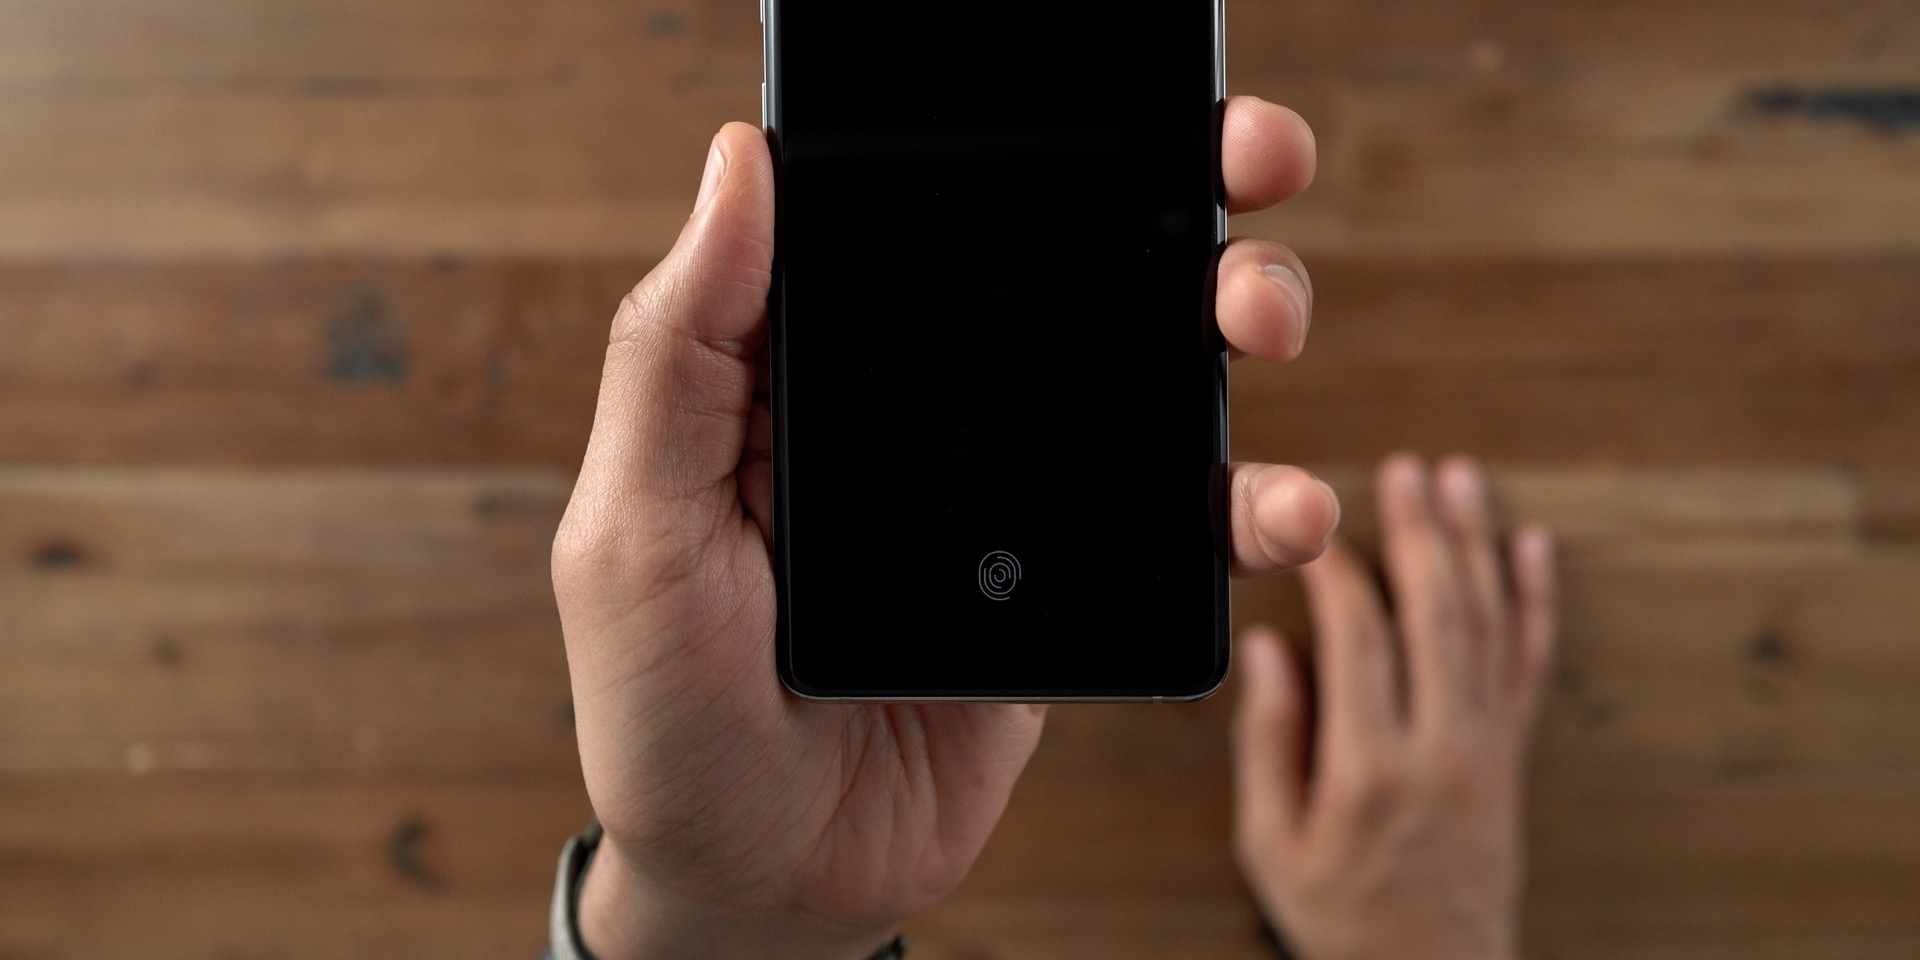 Galaxy S10+ vs iPhone In-Display fingerprint sensor